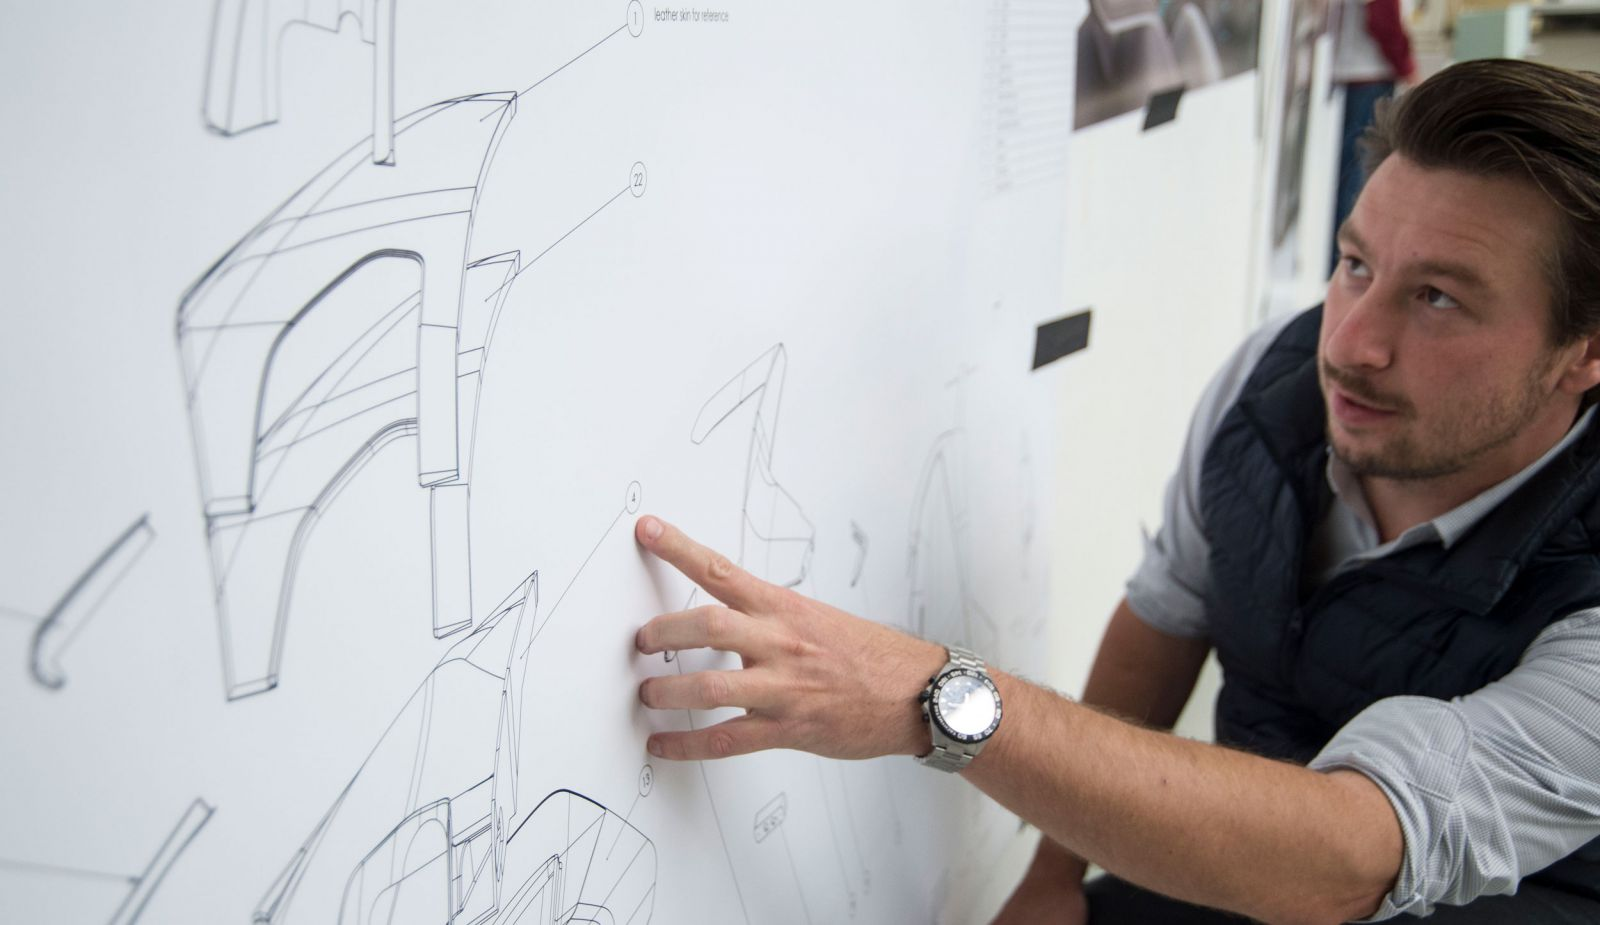 daniel hahn in front of sketches